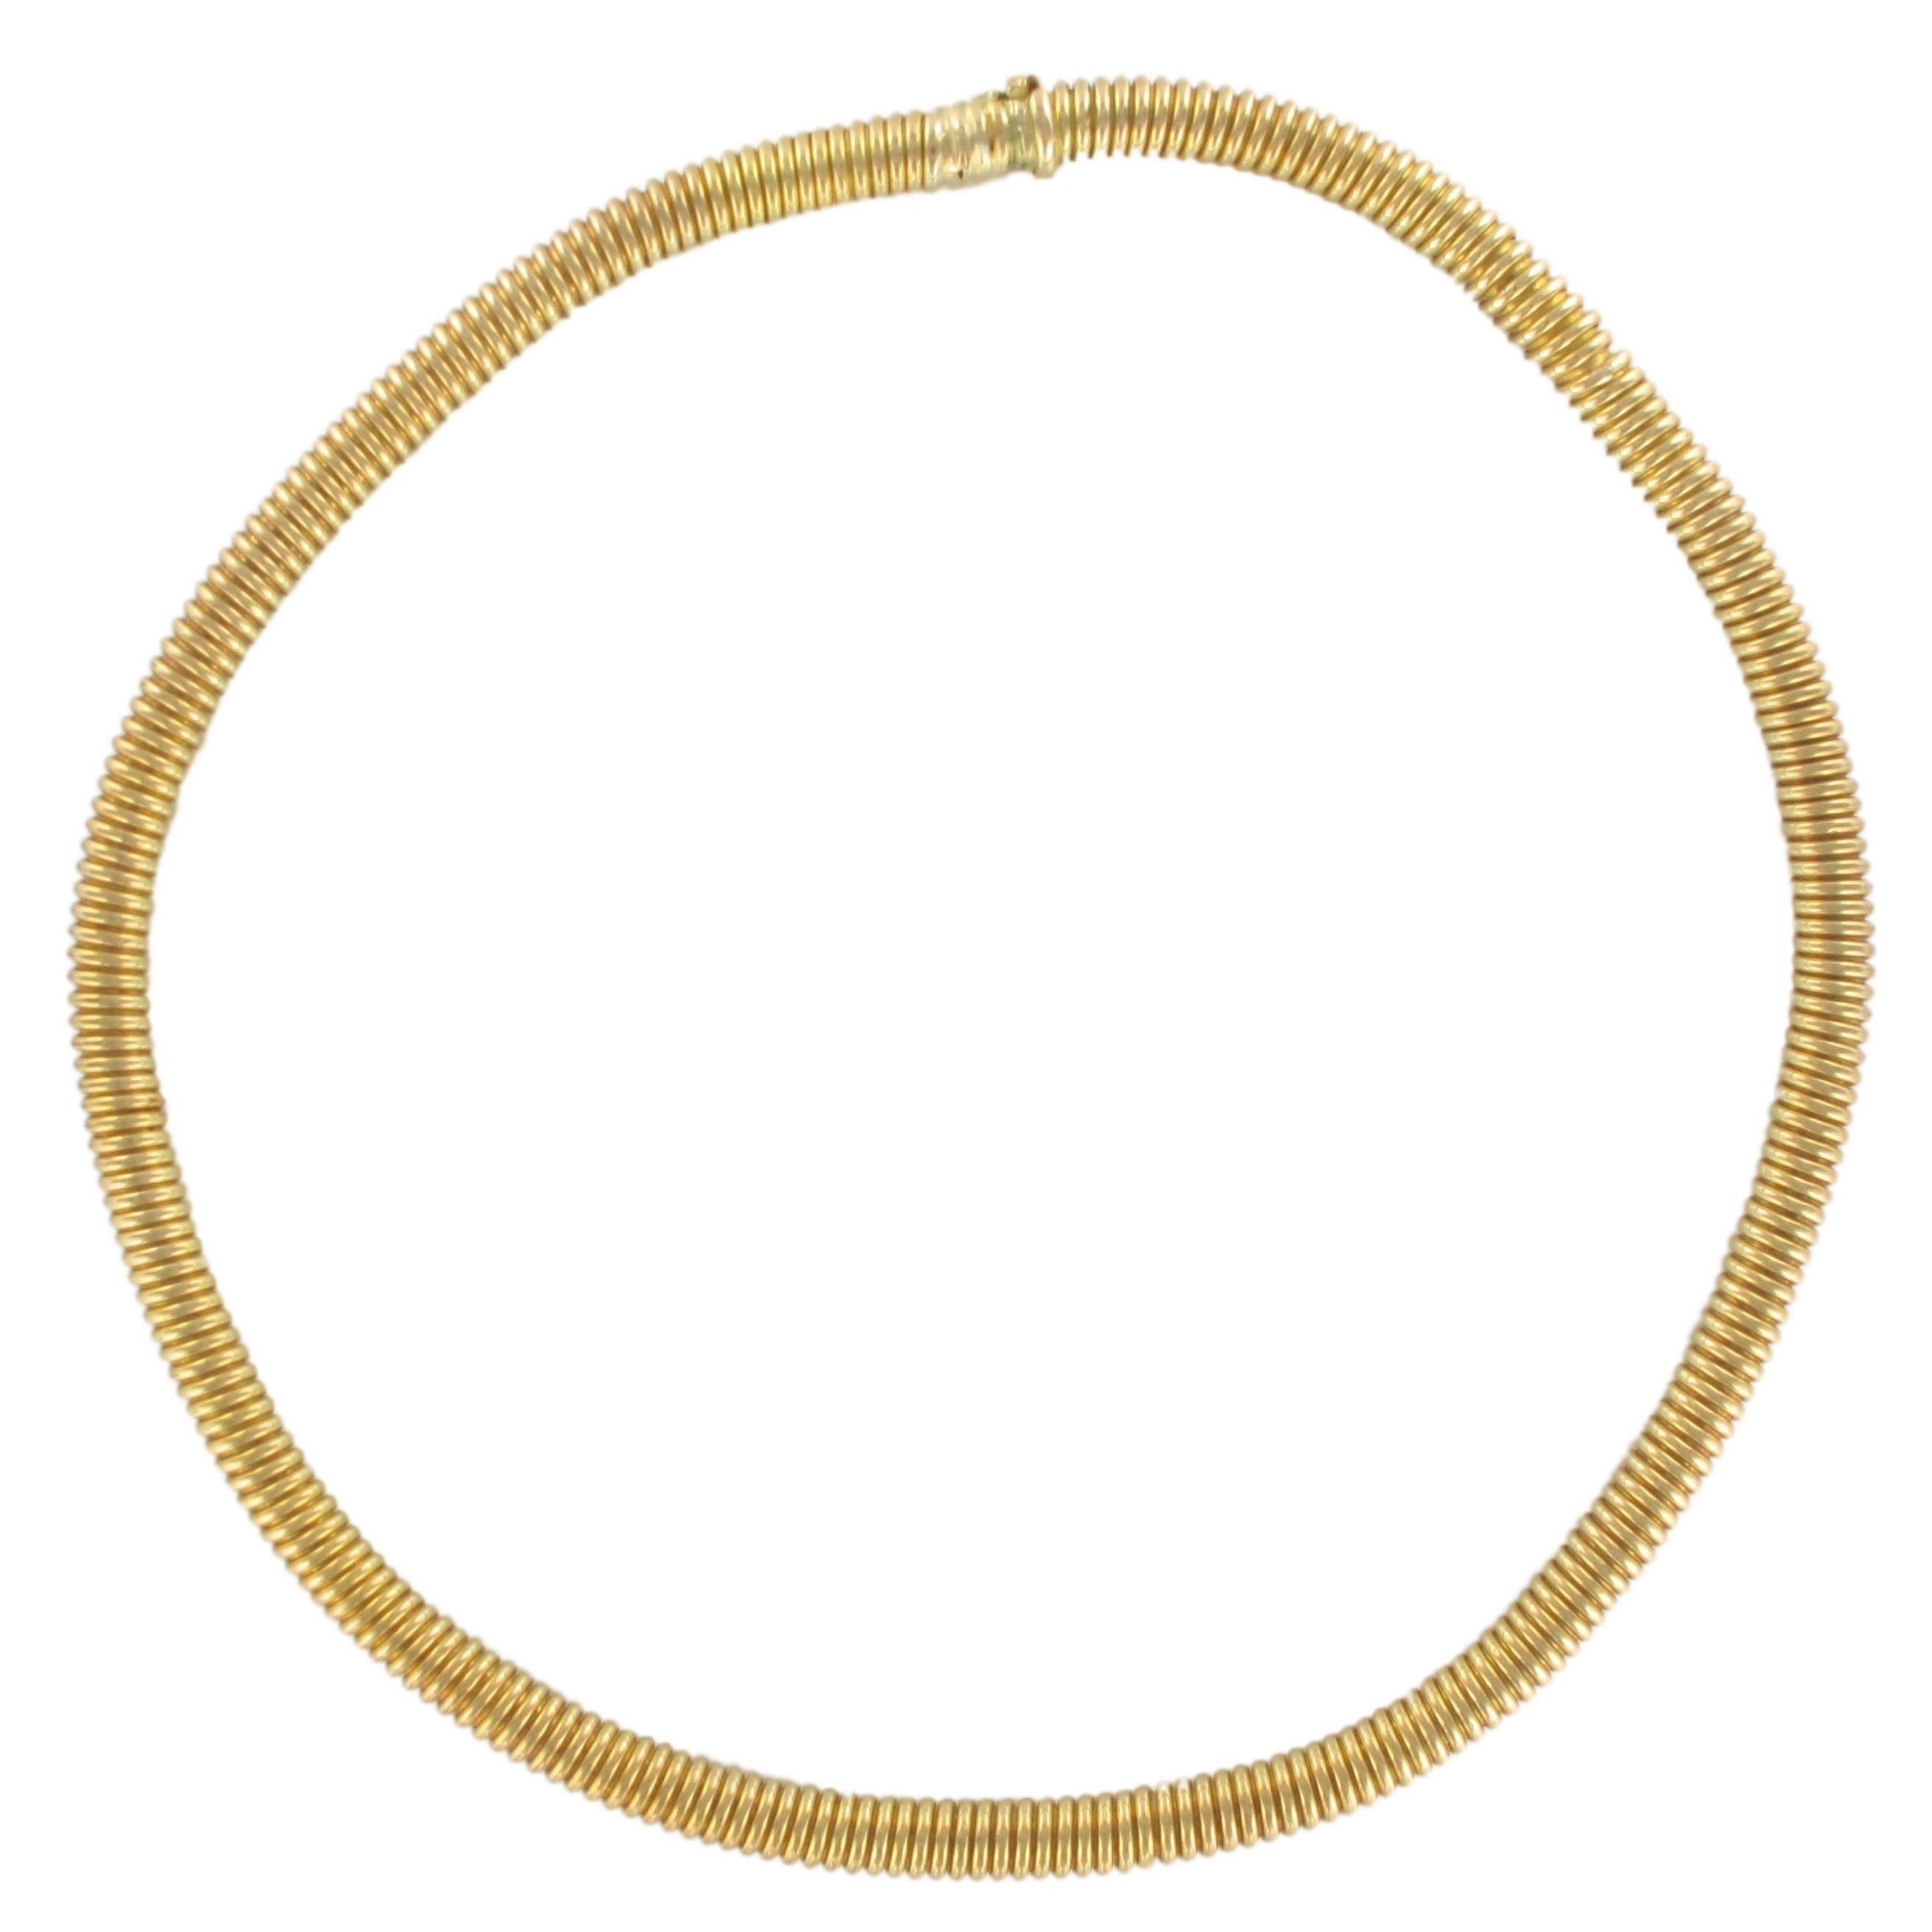 1950s French Retro Vintage 18 Karats Yellow Gold Tubogas Necklace